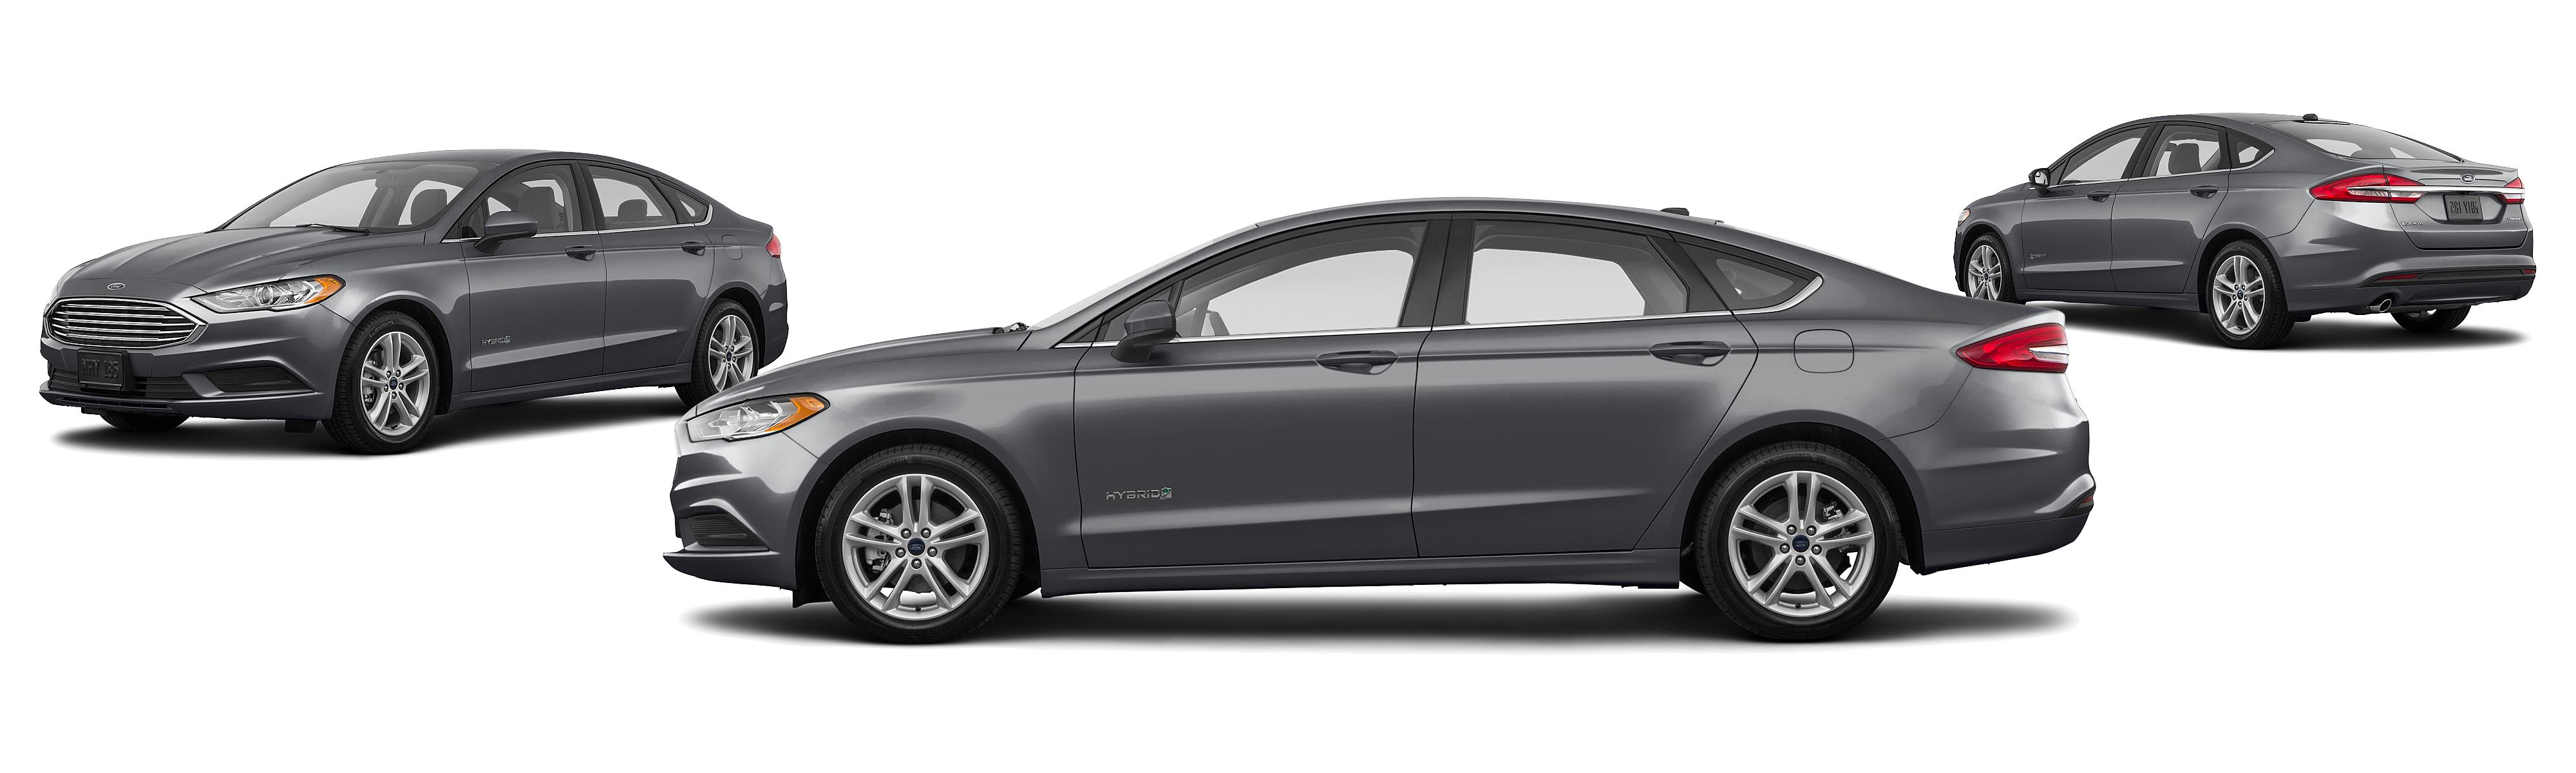 2018 Ford Fusion Hybrid Platinum 4dr Sedan Research GrooveCar